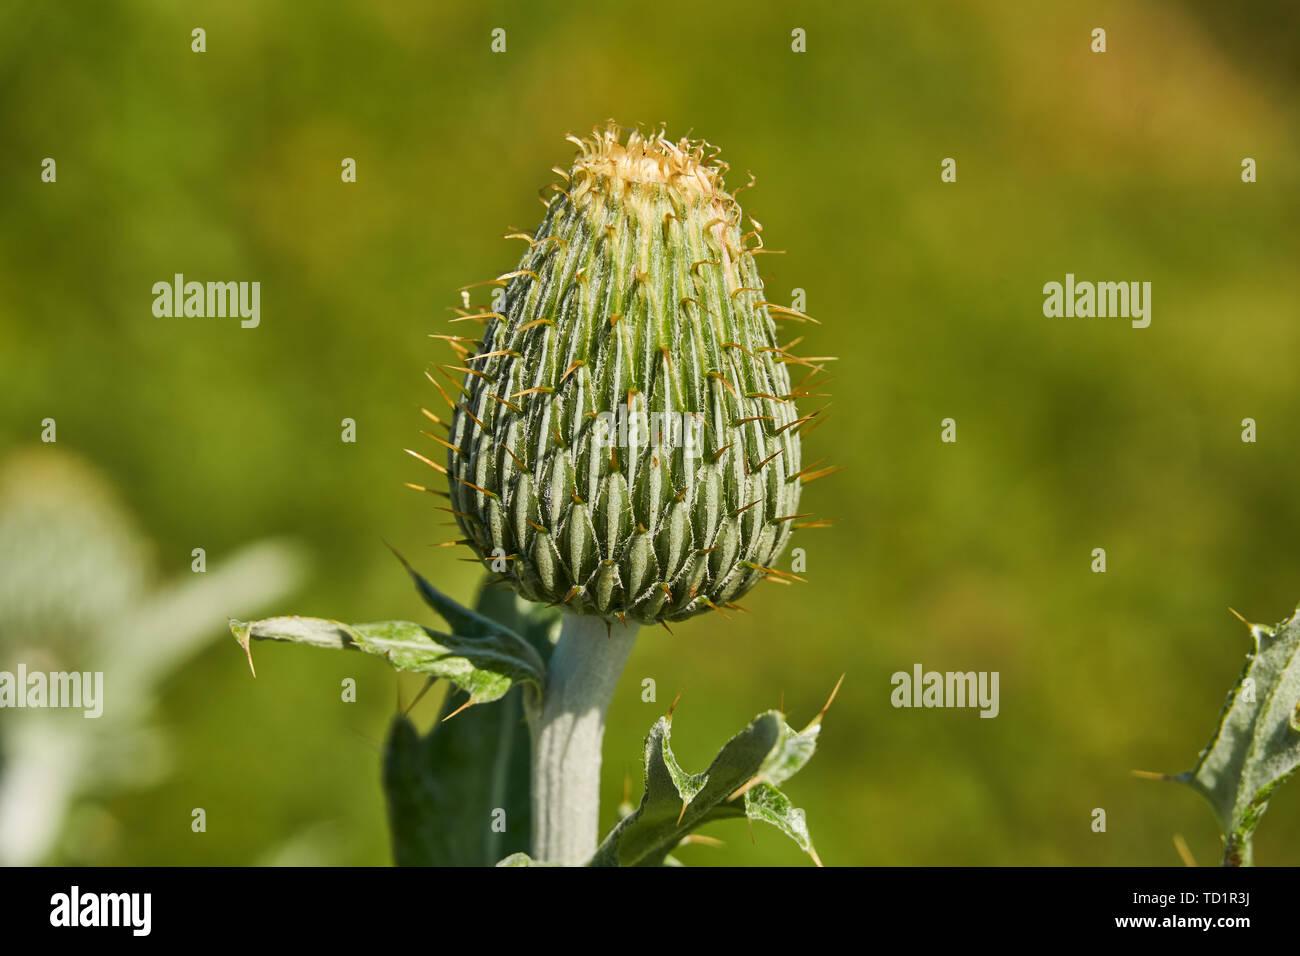 Texas Thistle Isolated preblossom bud (Cirsium texanum)